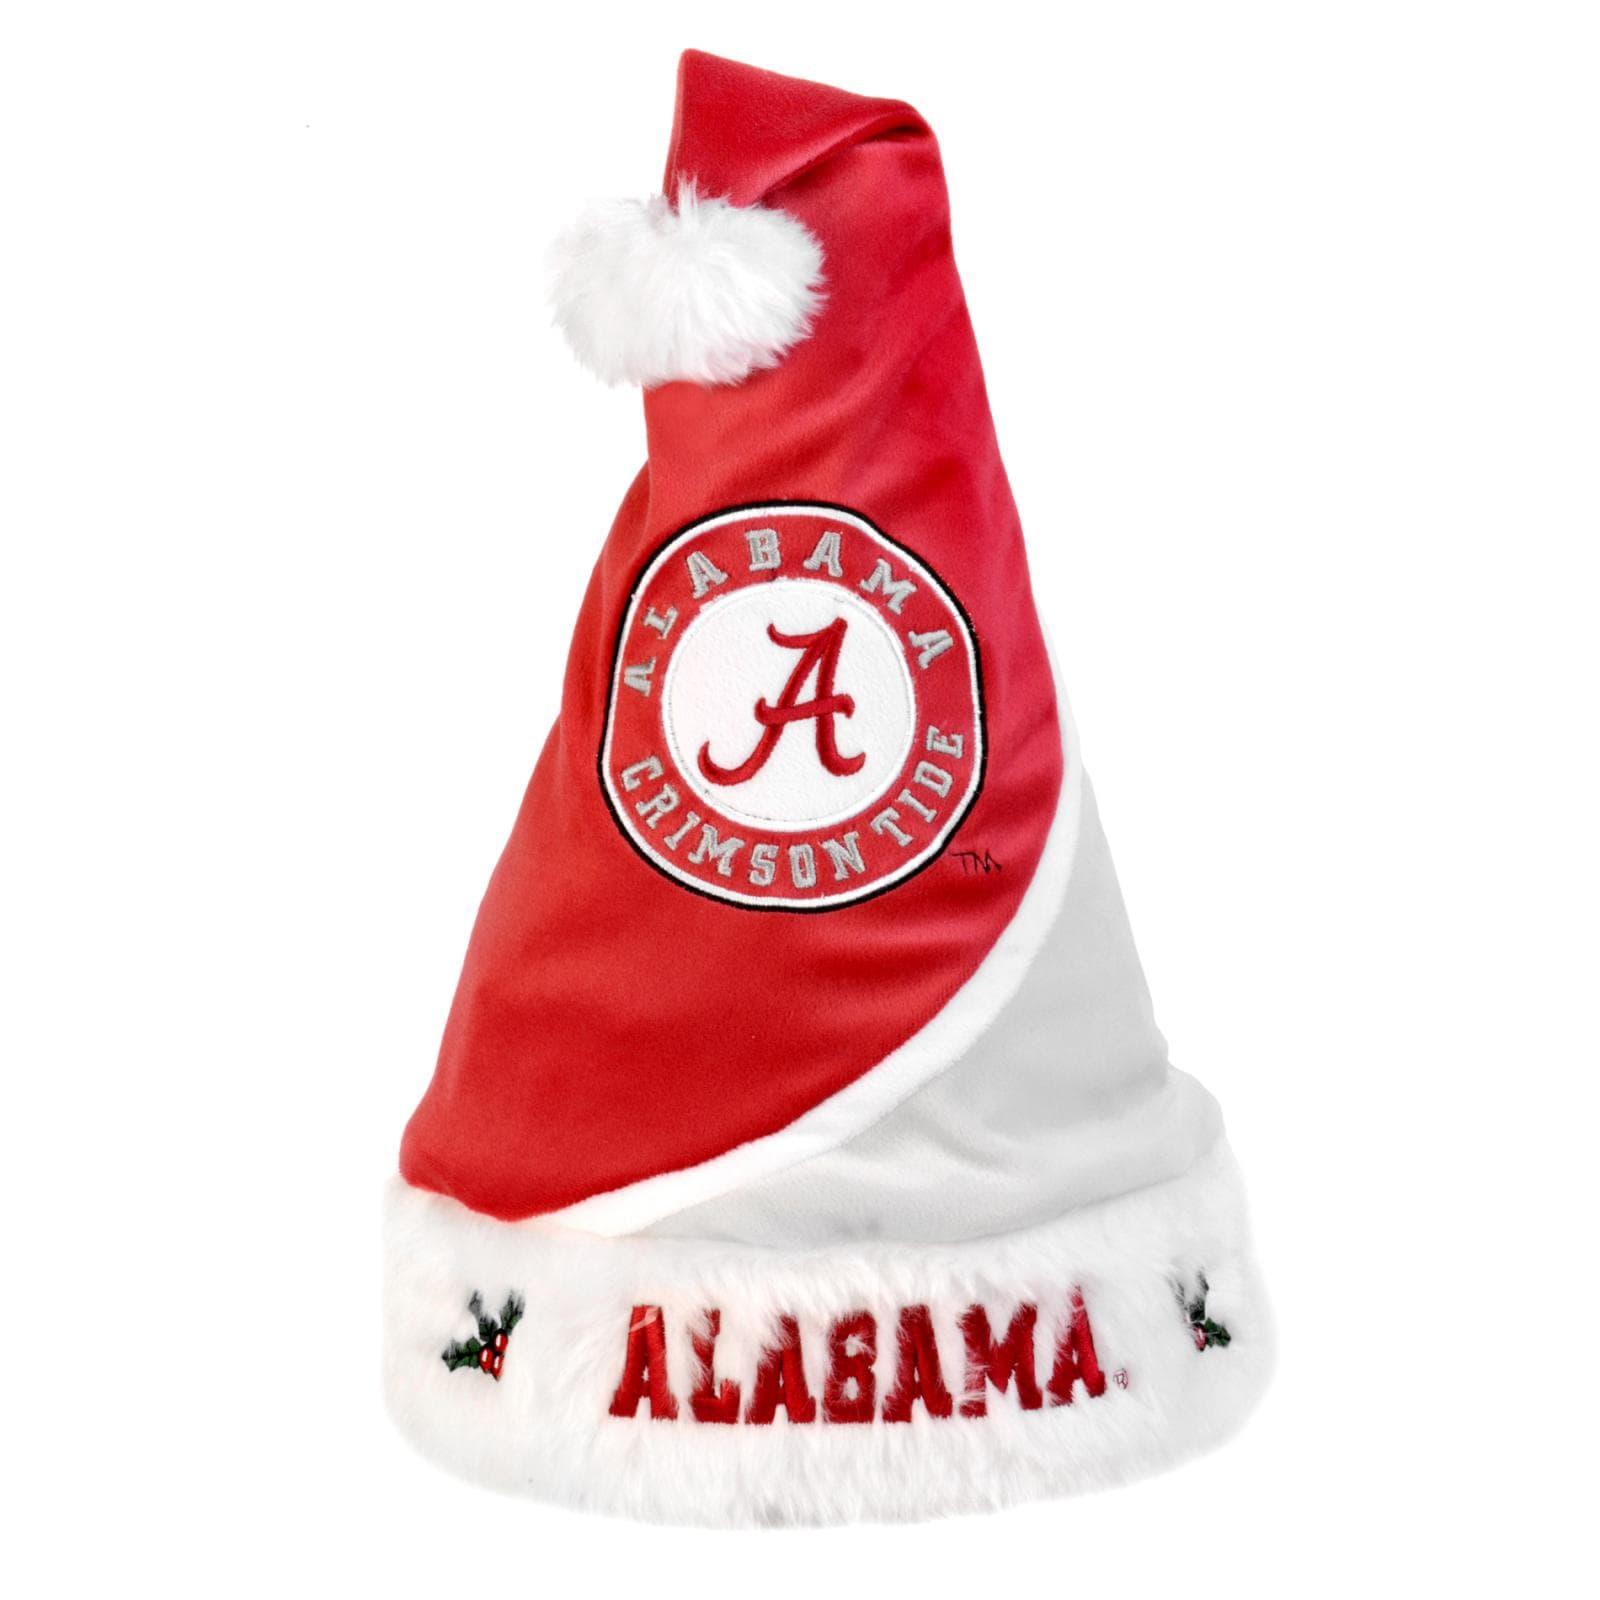 Alabama Crimson Tide Polyester Santa Hat